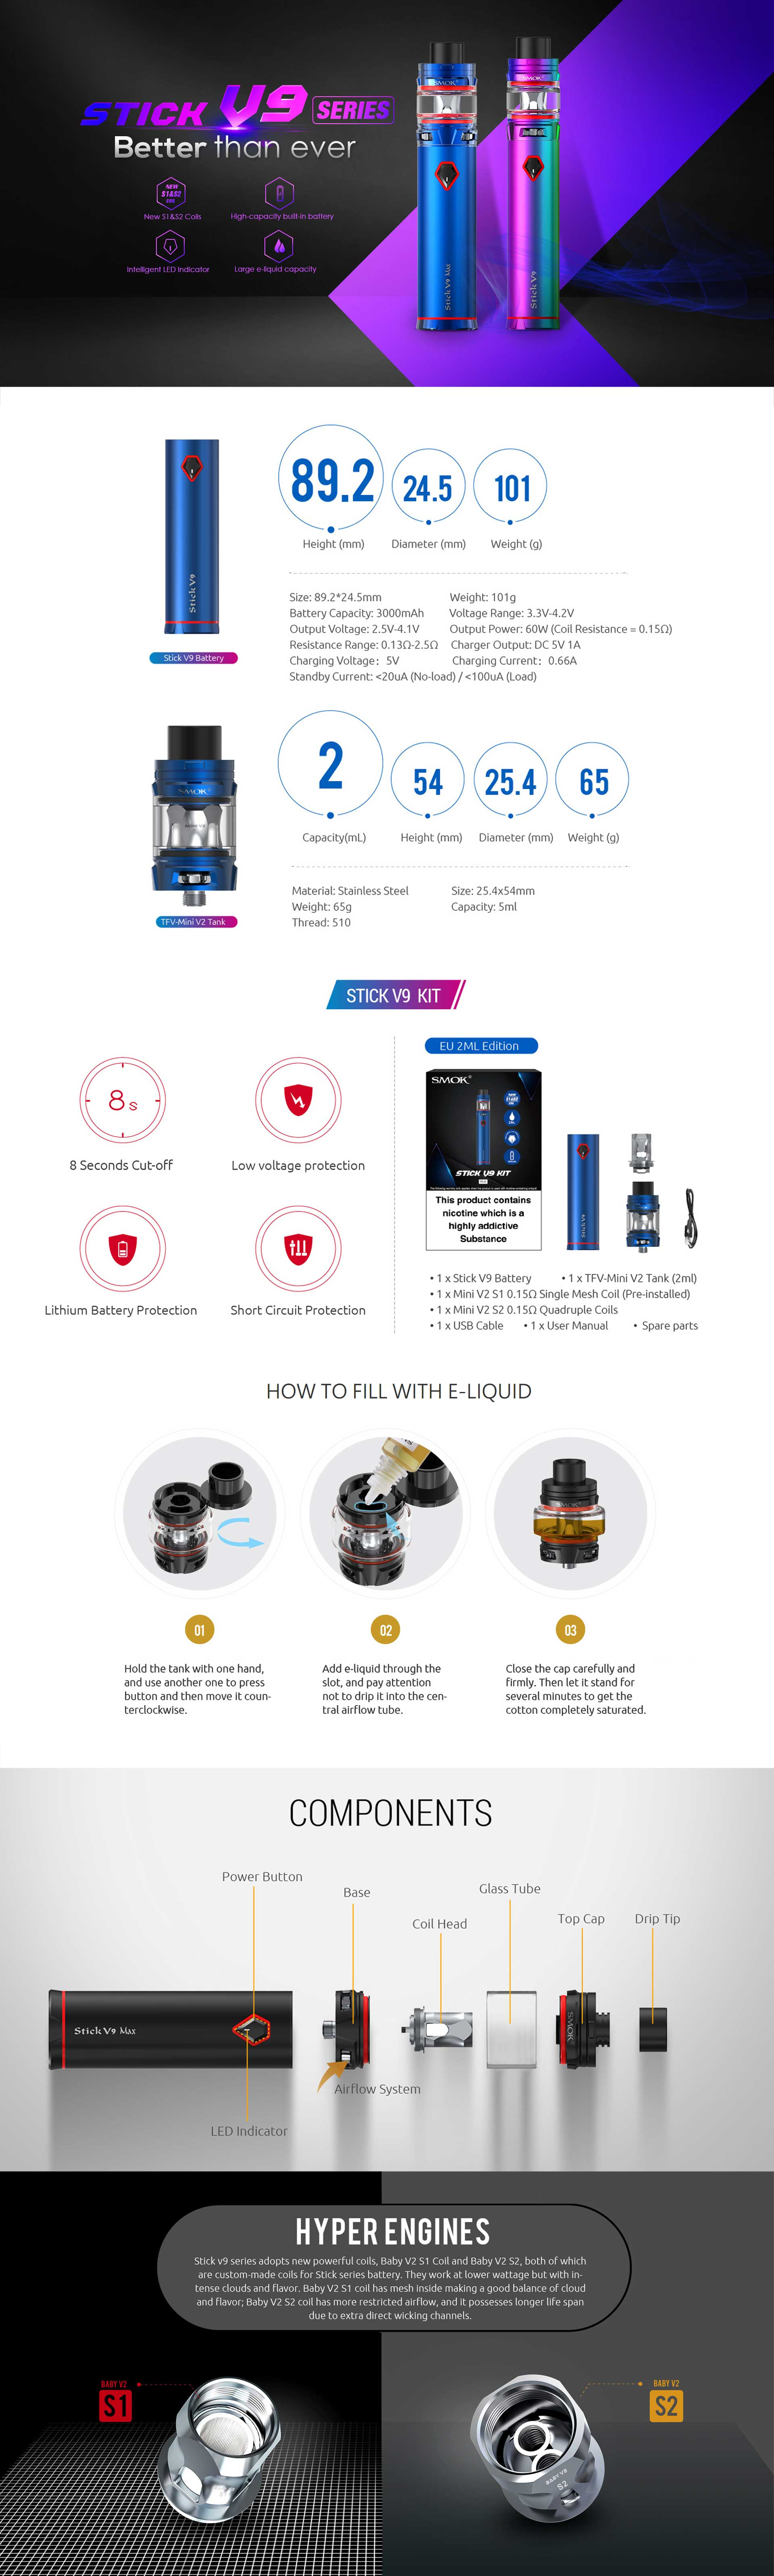 Comprar Smok Stick V9 Kit, características